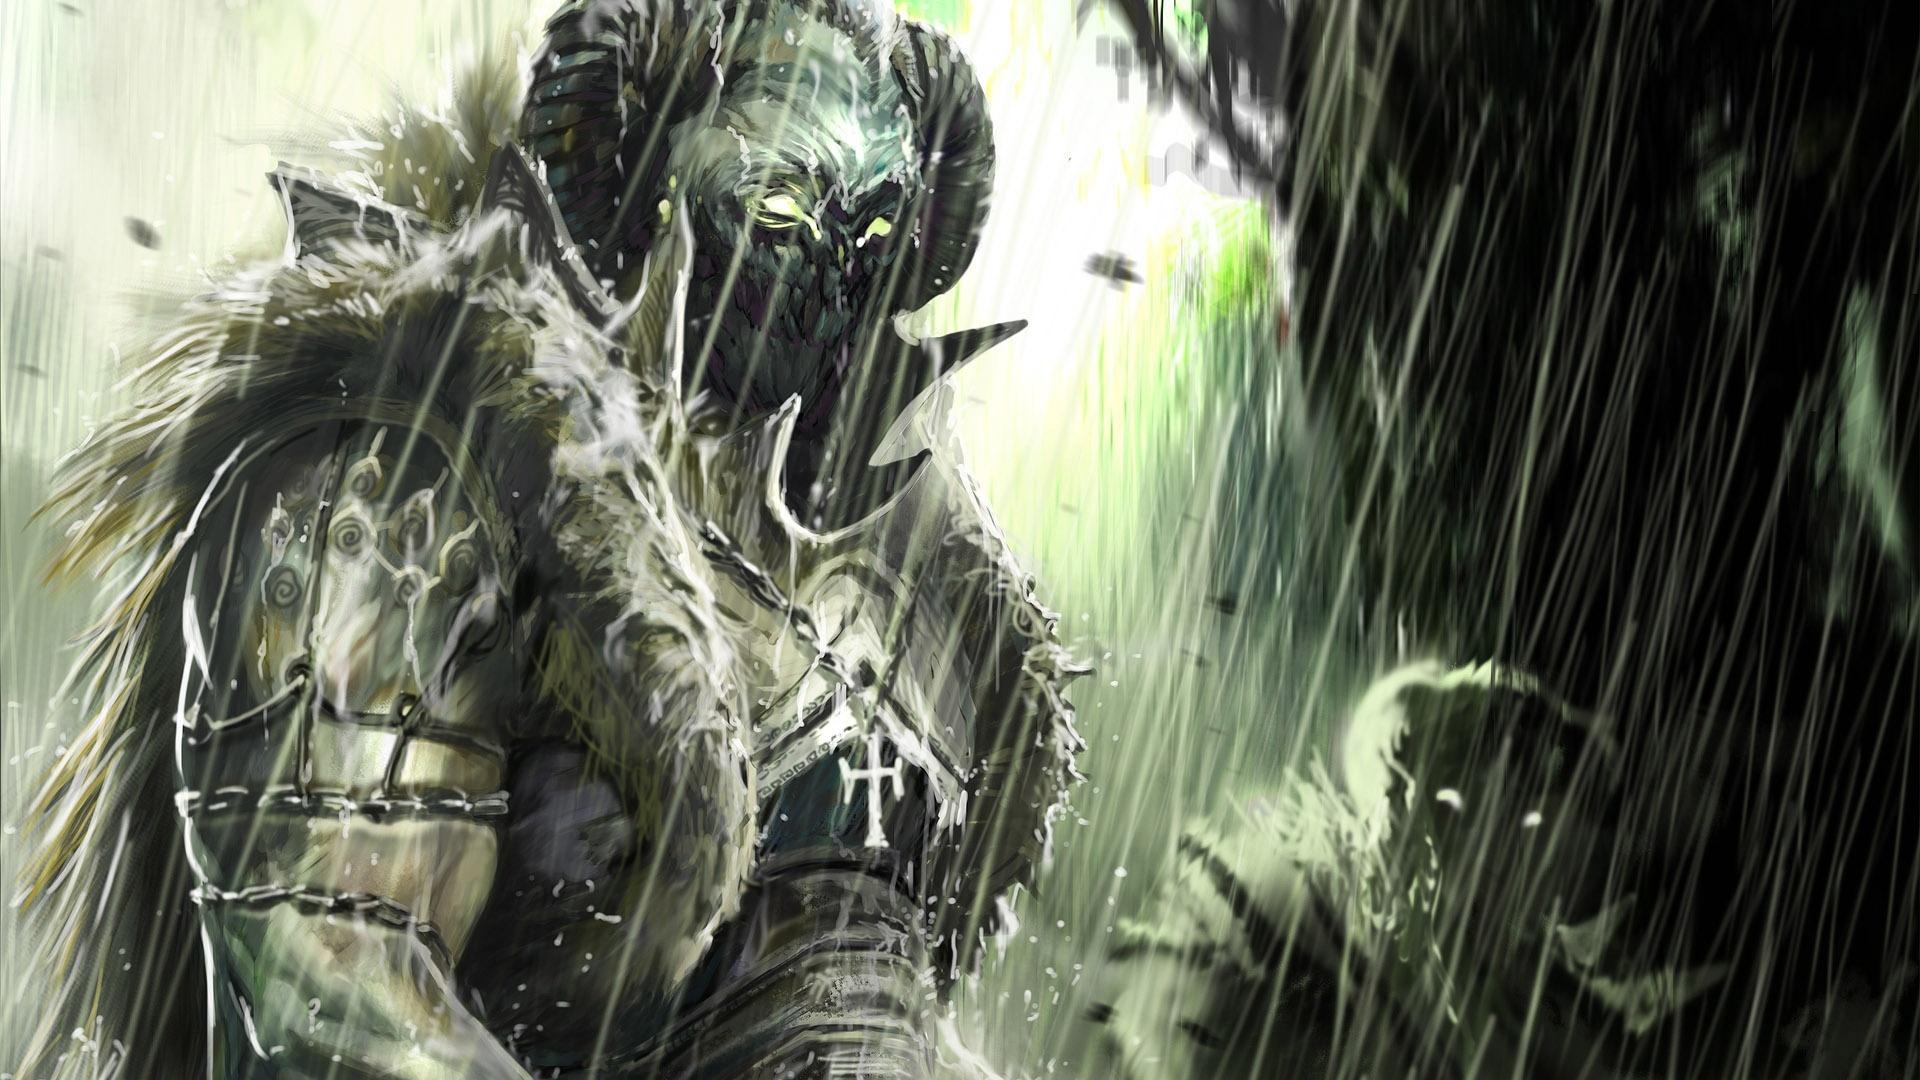 Horror 3d S Hd Hd Wallpaper